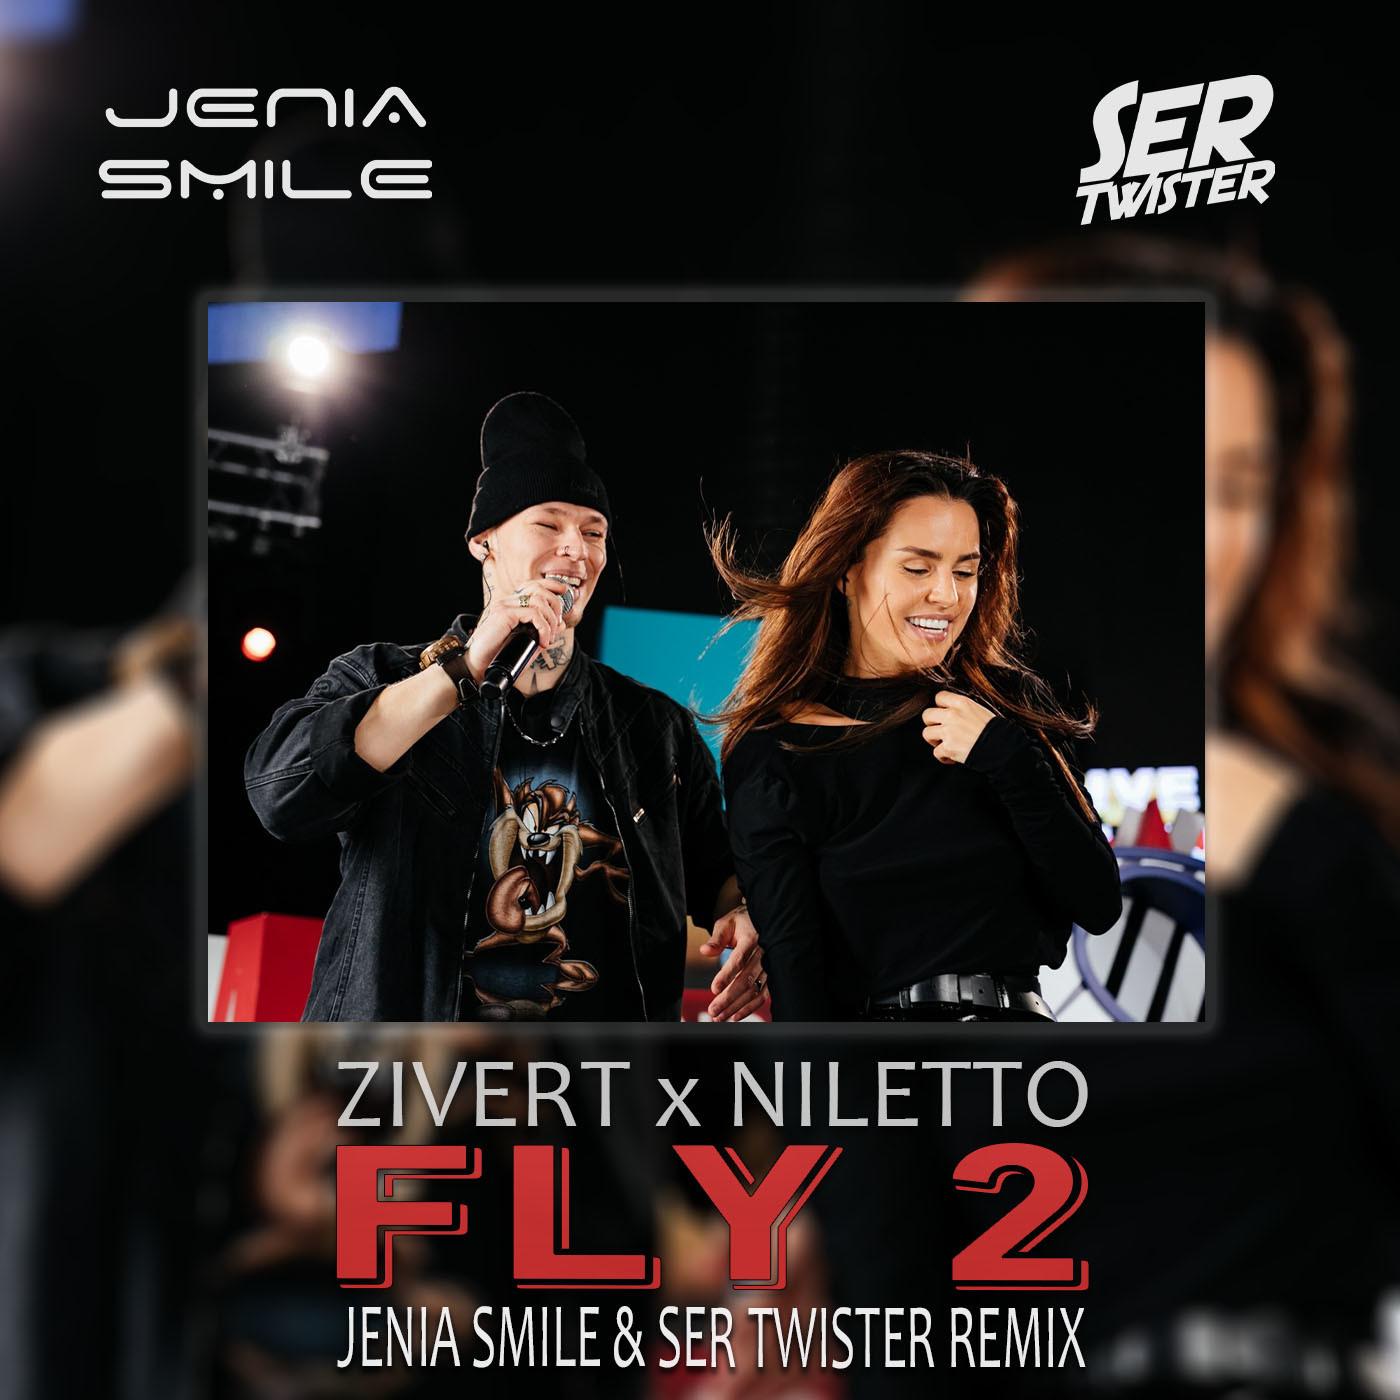 Zivert, NILETTO - Fly 2 (Jenia Smile & Ser Twister Remix)